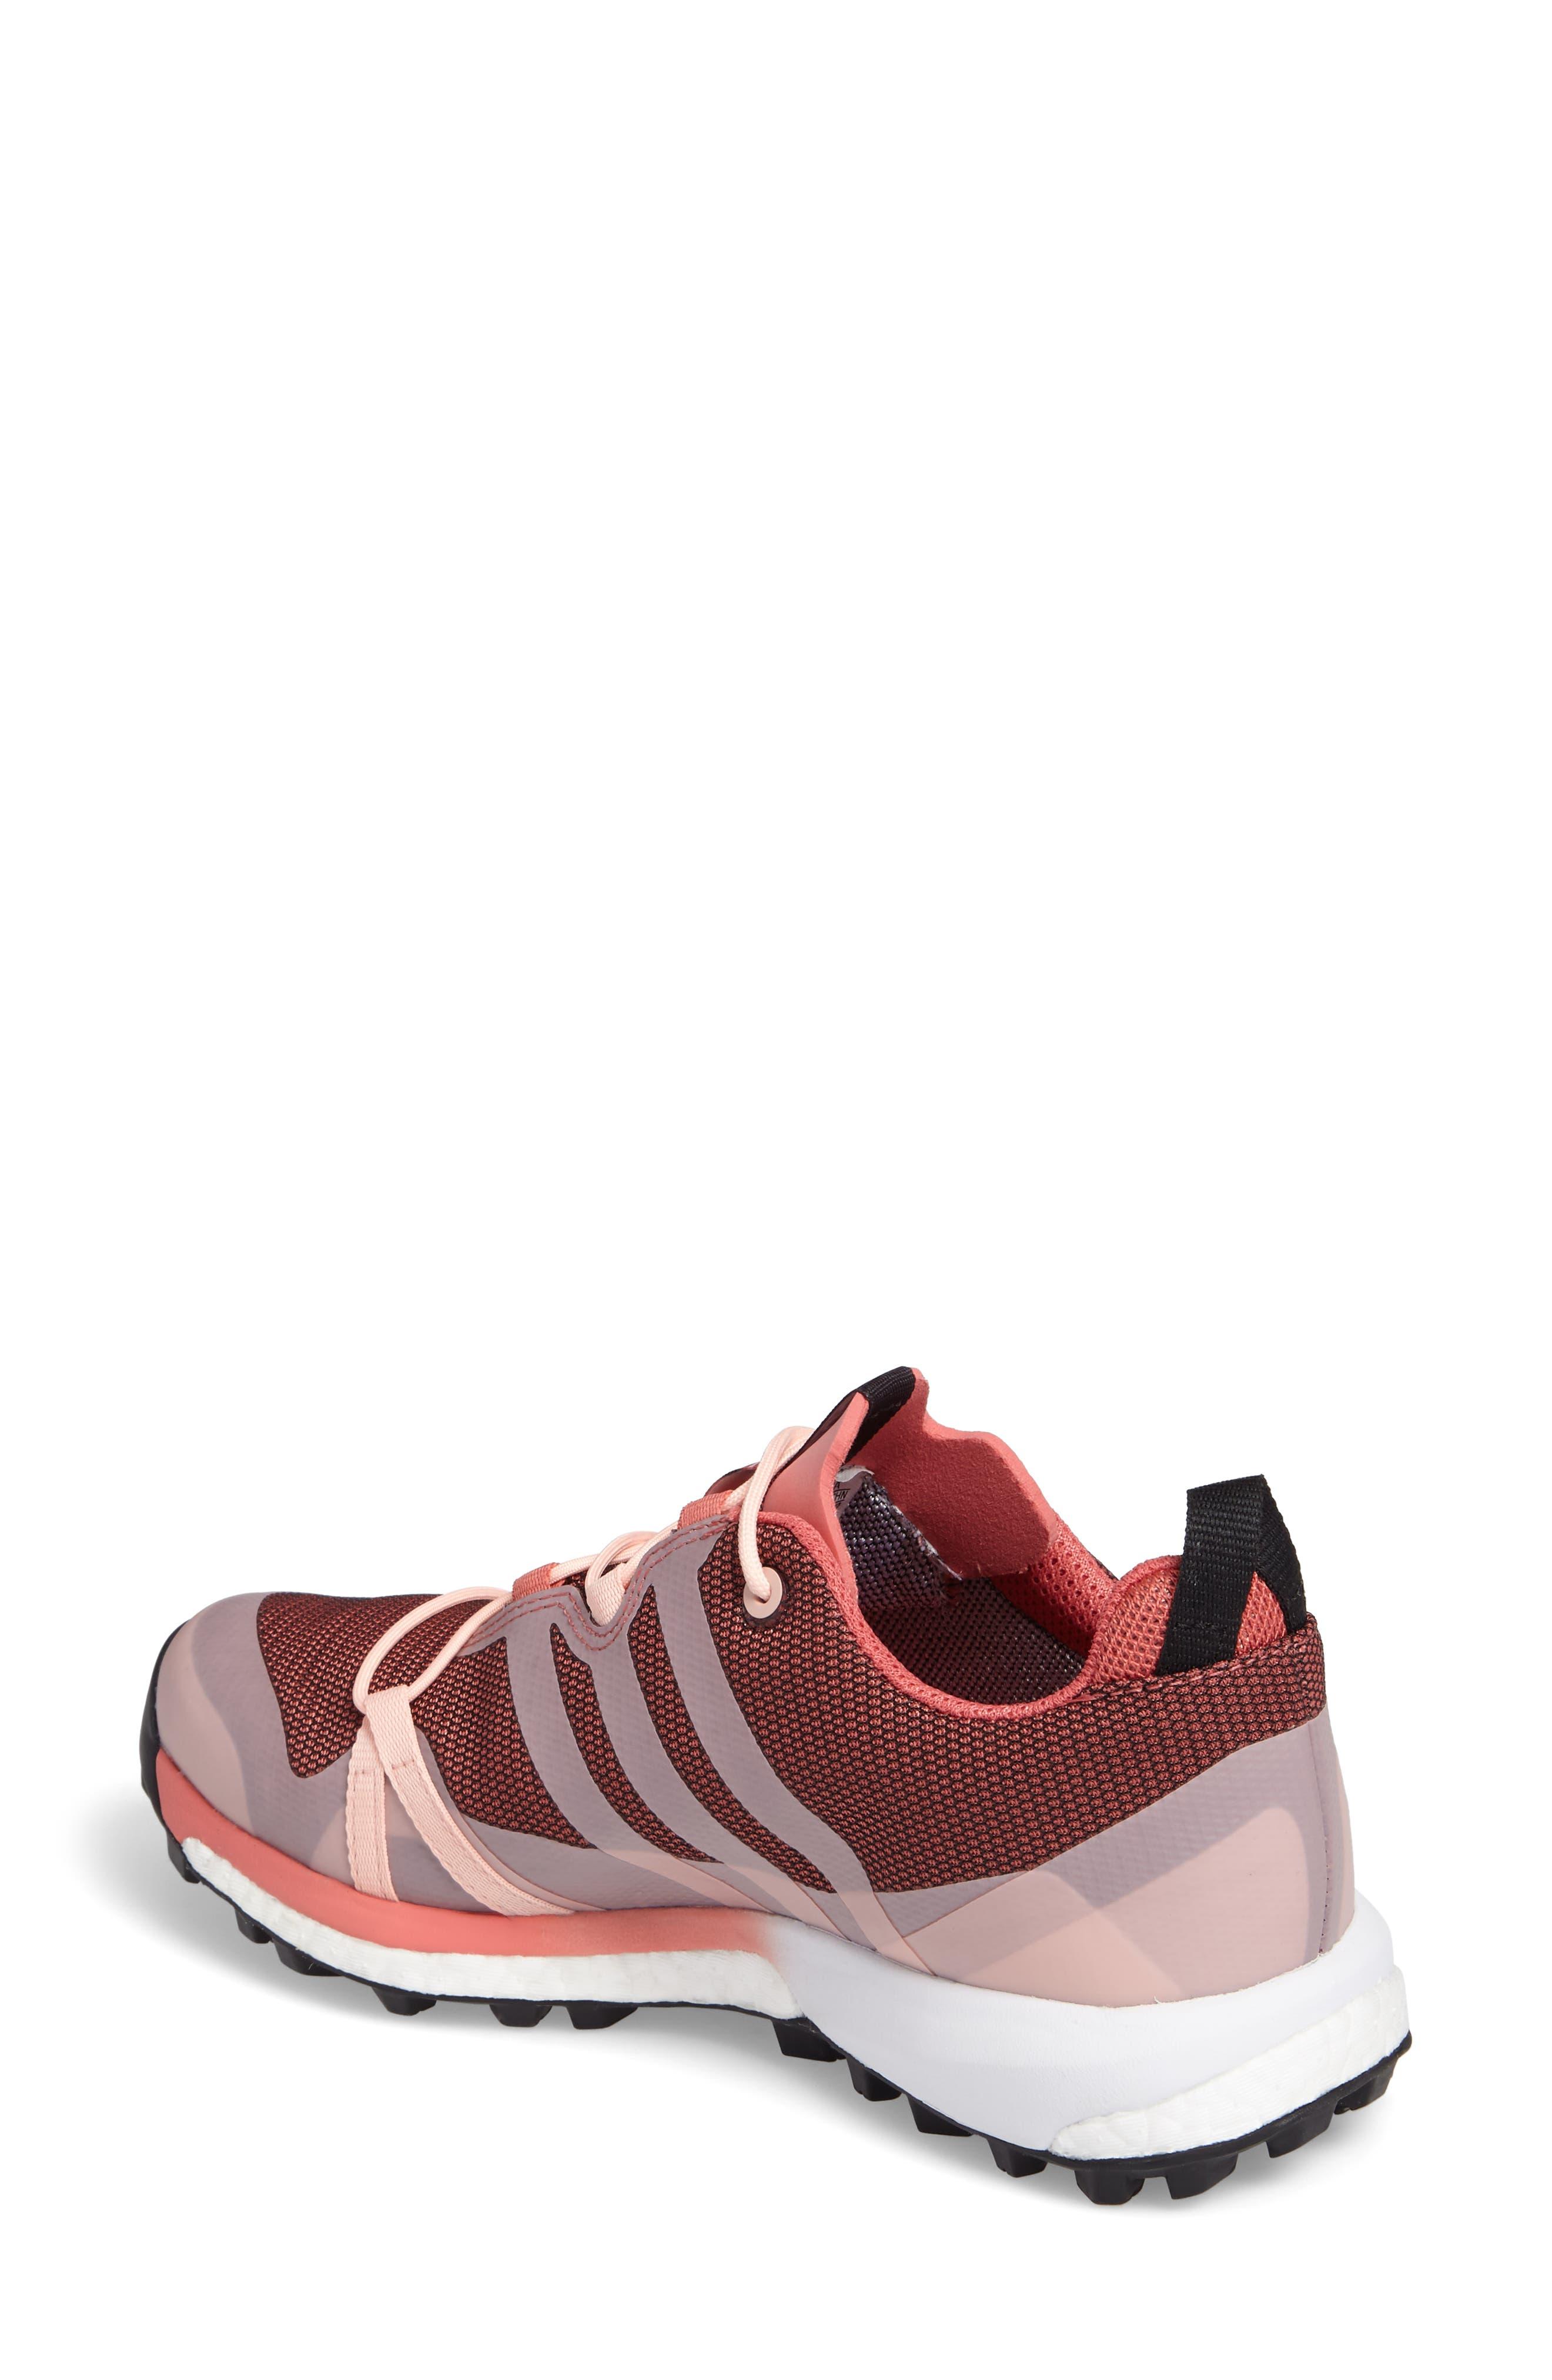 'Terrex Agravic GTX' Trail Shoe,                             Alternate thumbnail 9, color,